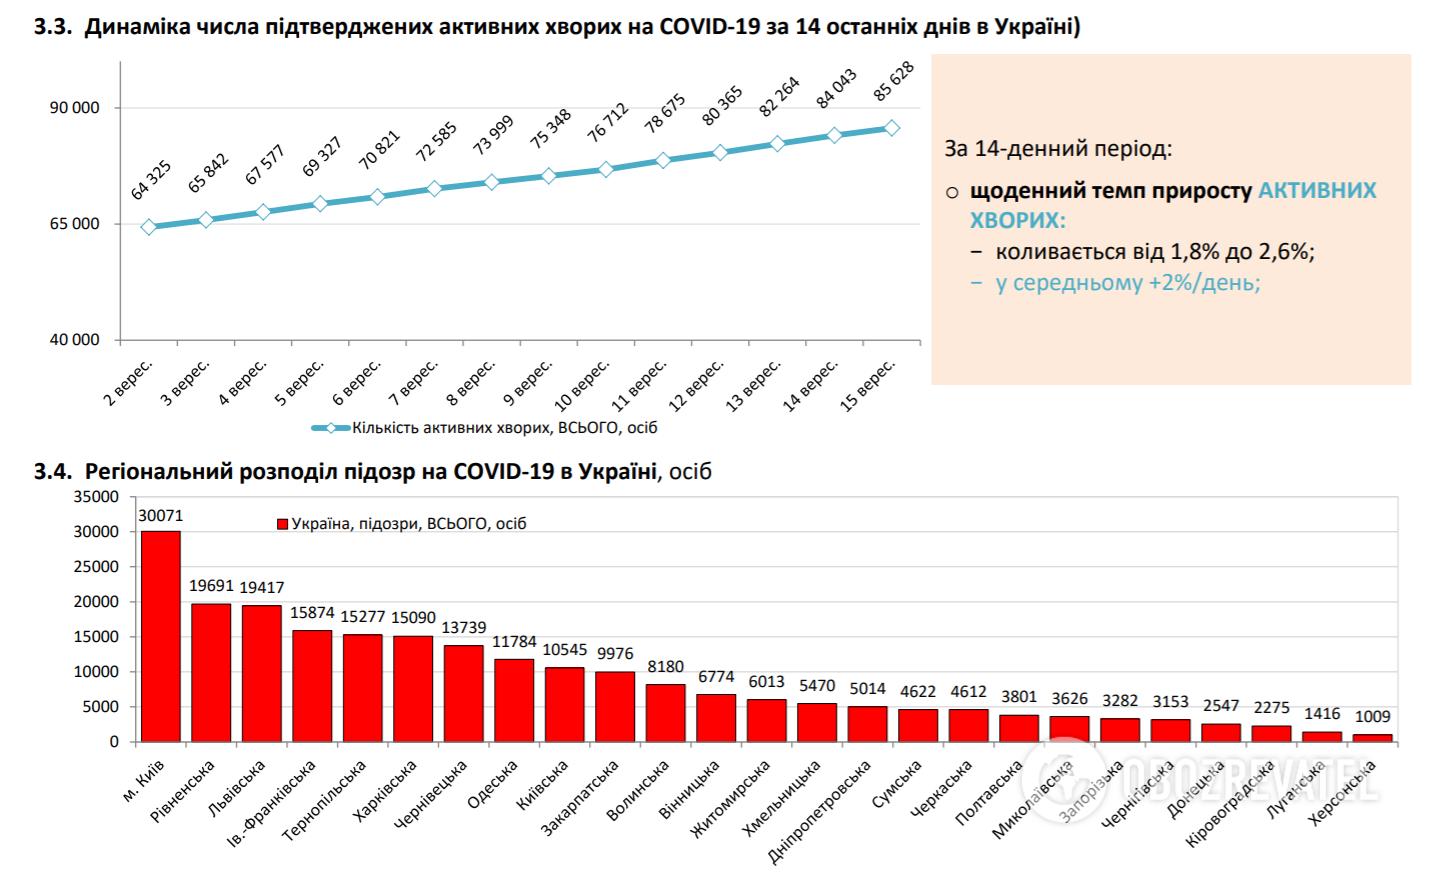 Динаміка числа підтверджених активних хворих на COVID-19 .